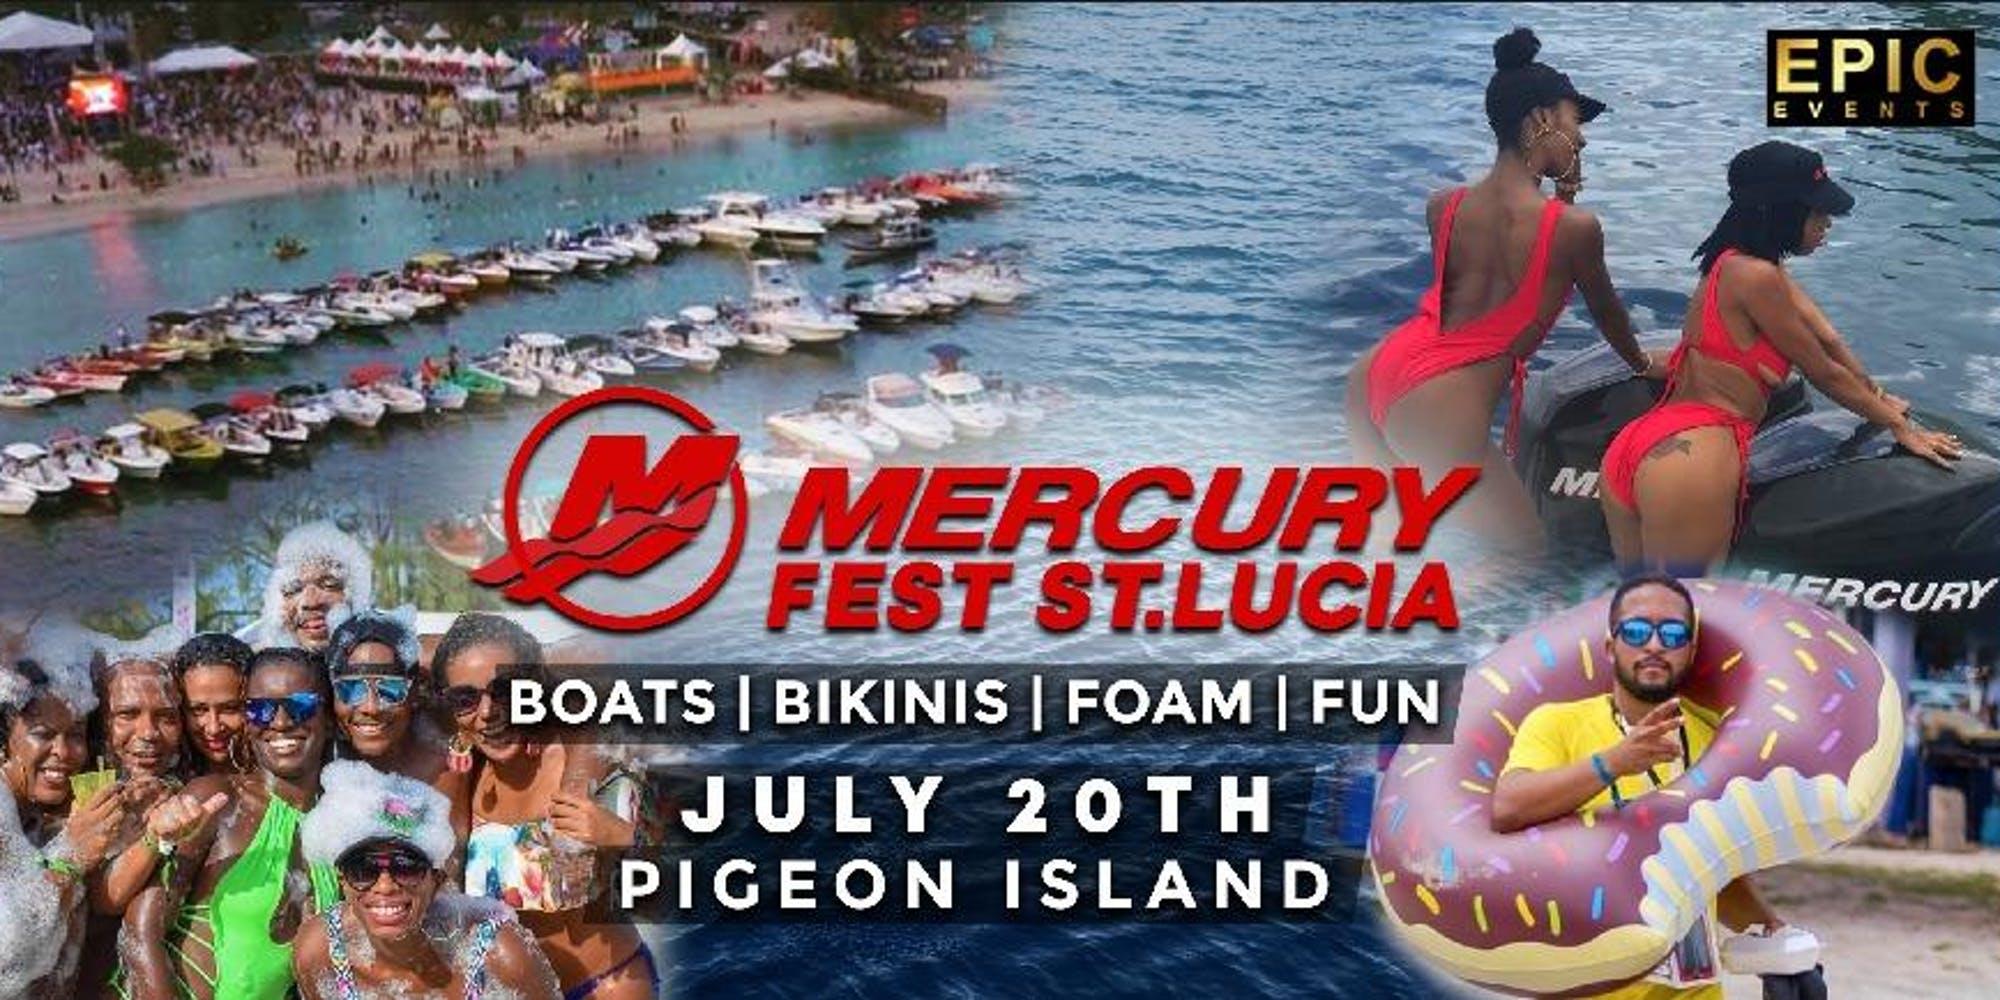 Mercury Fest St. Lucia The Ultimate Beach Party! Boats - Bikinis - Foam - Fun July 20, 2019 Pigeon Island Beach. The Best DJs from St. Lucia, Martinique, Guadeloupe, St. Martin, Trinidad. Performances by Wayne Wonder & Kranium